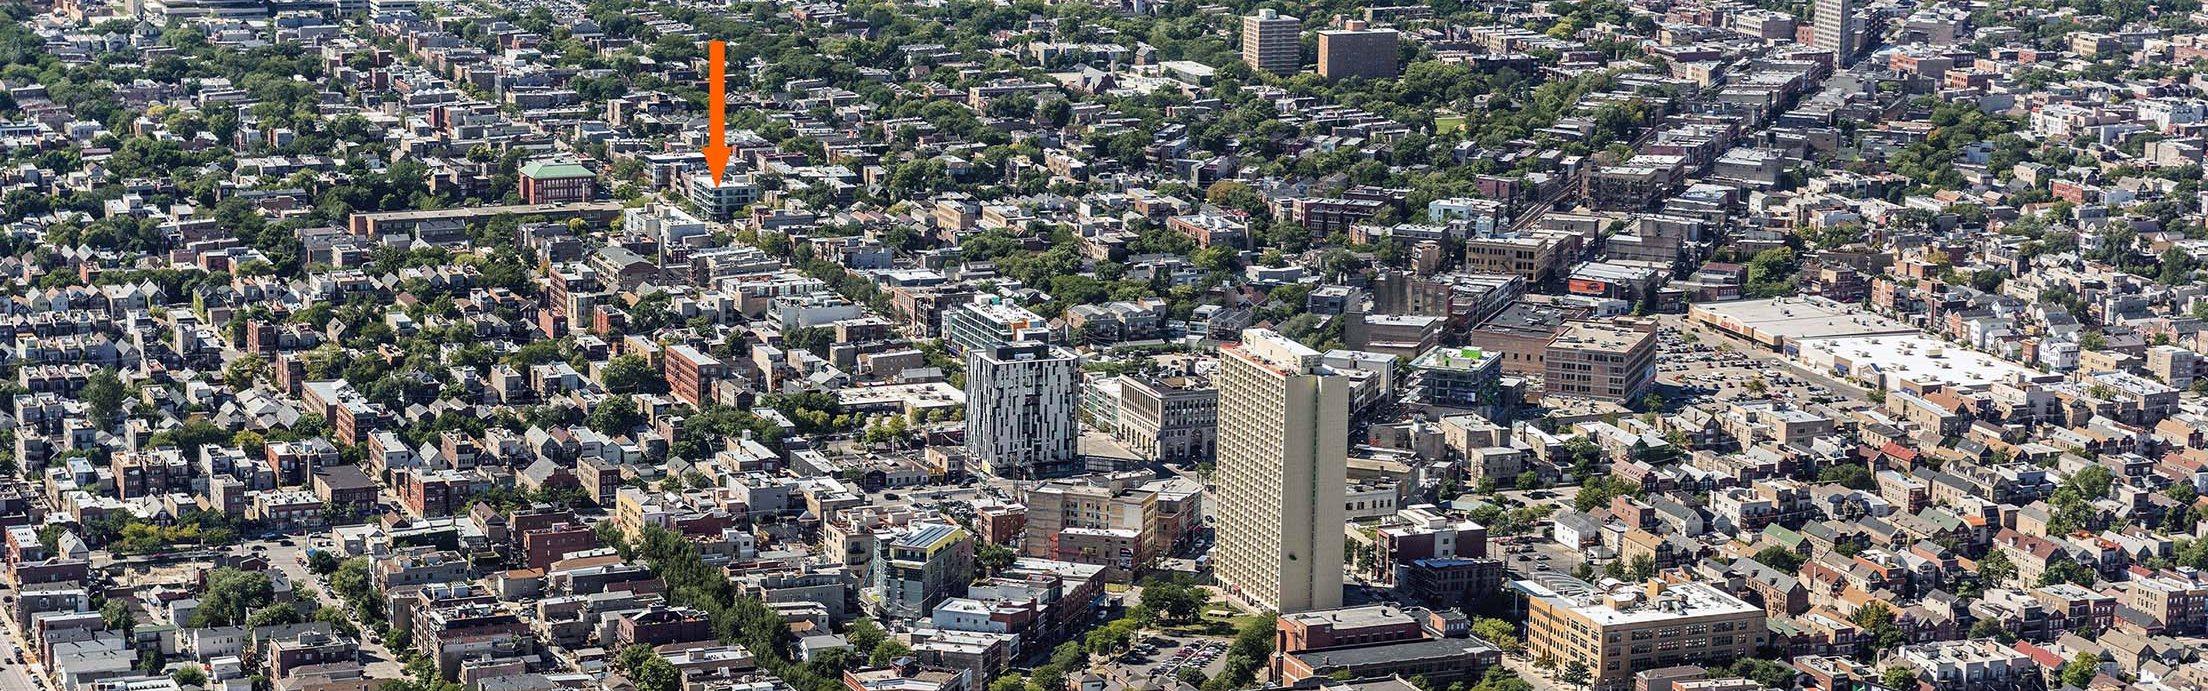 WIcker Park Aerial